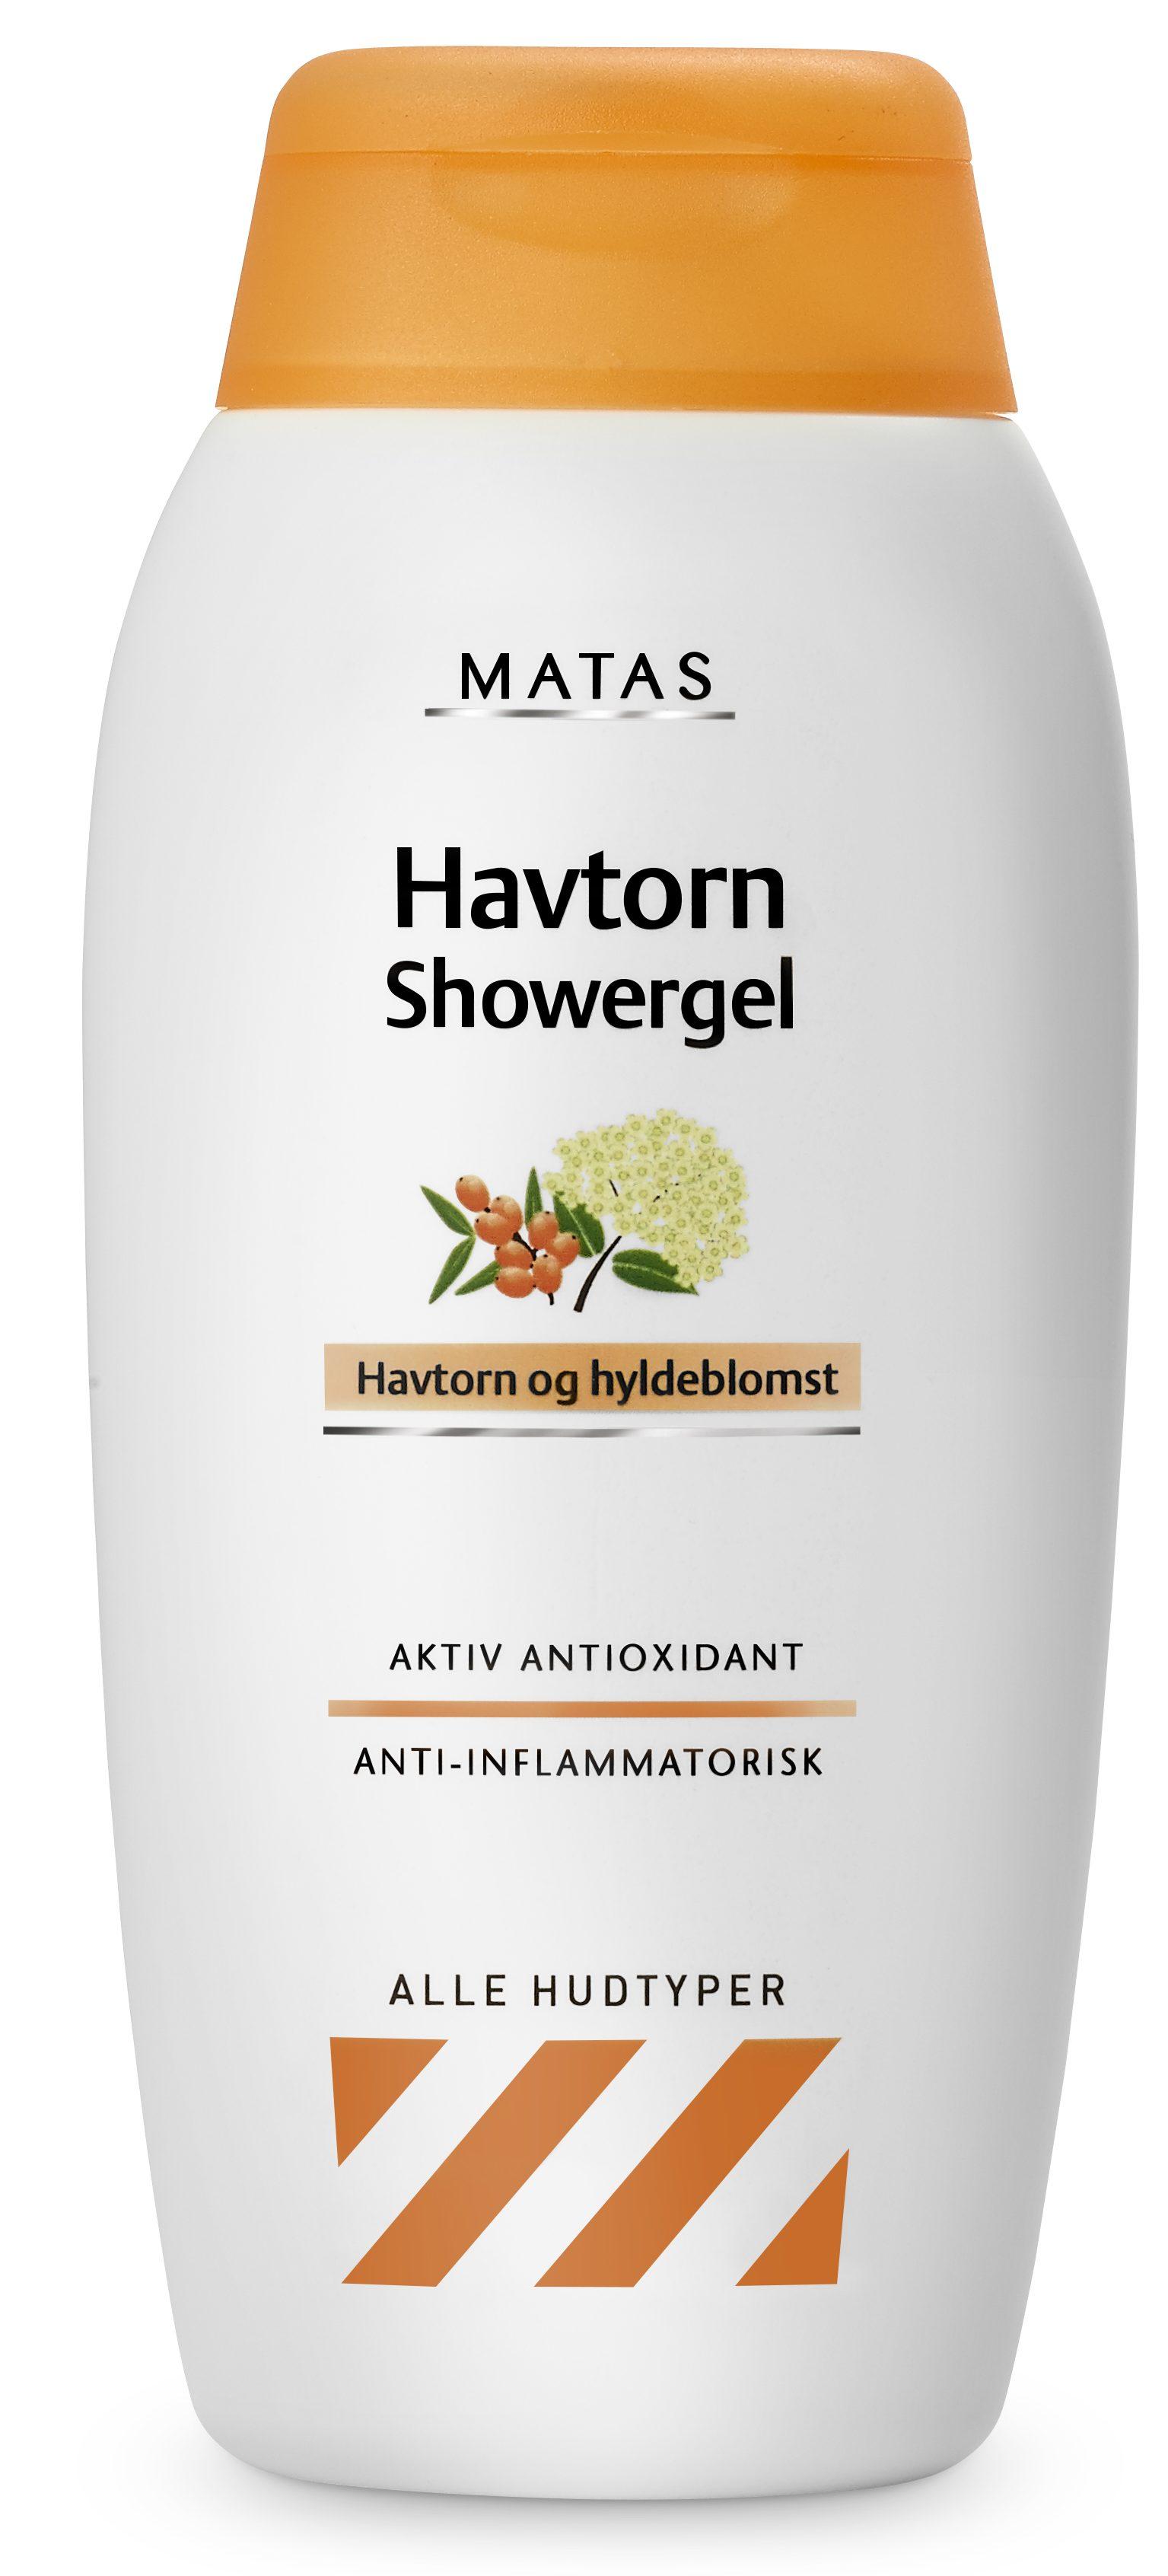 Matas Havtorn Showergel